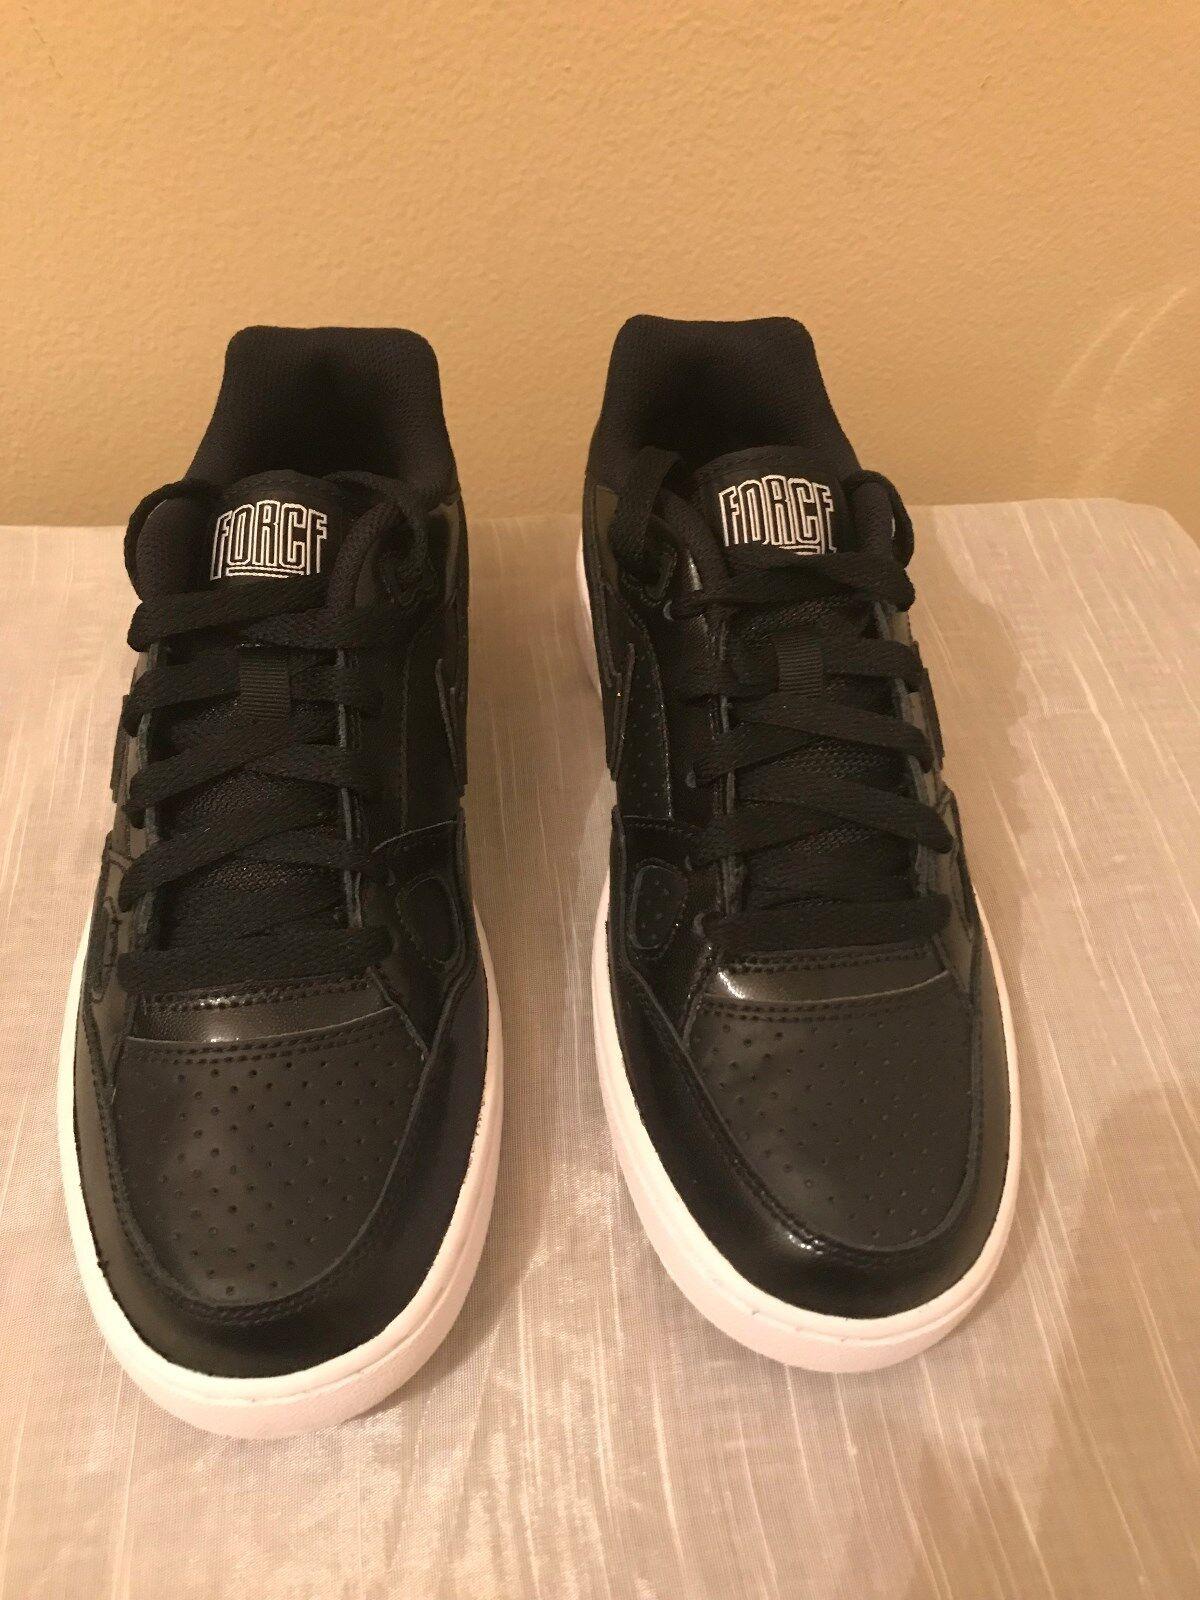 Women's Black Nike Nike Nike Son Of force Low Top Leather Sneaker Size 8 M 01456f